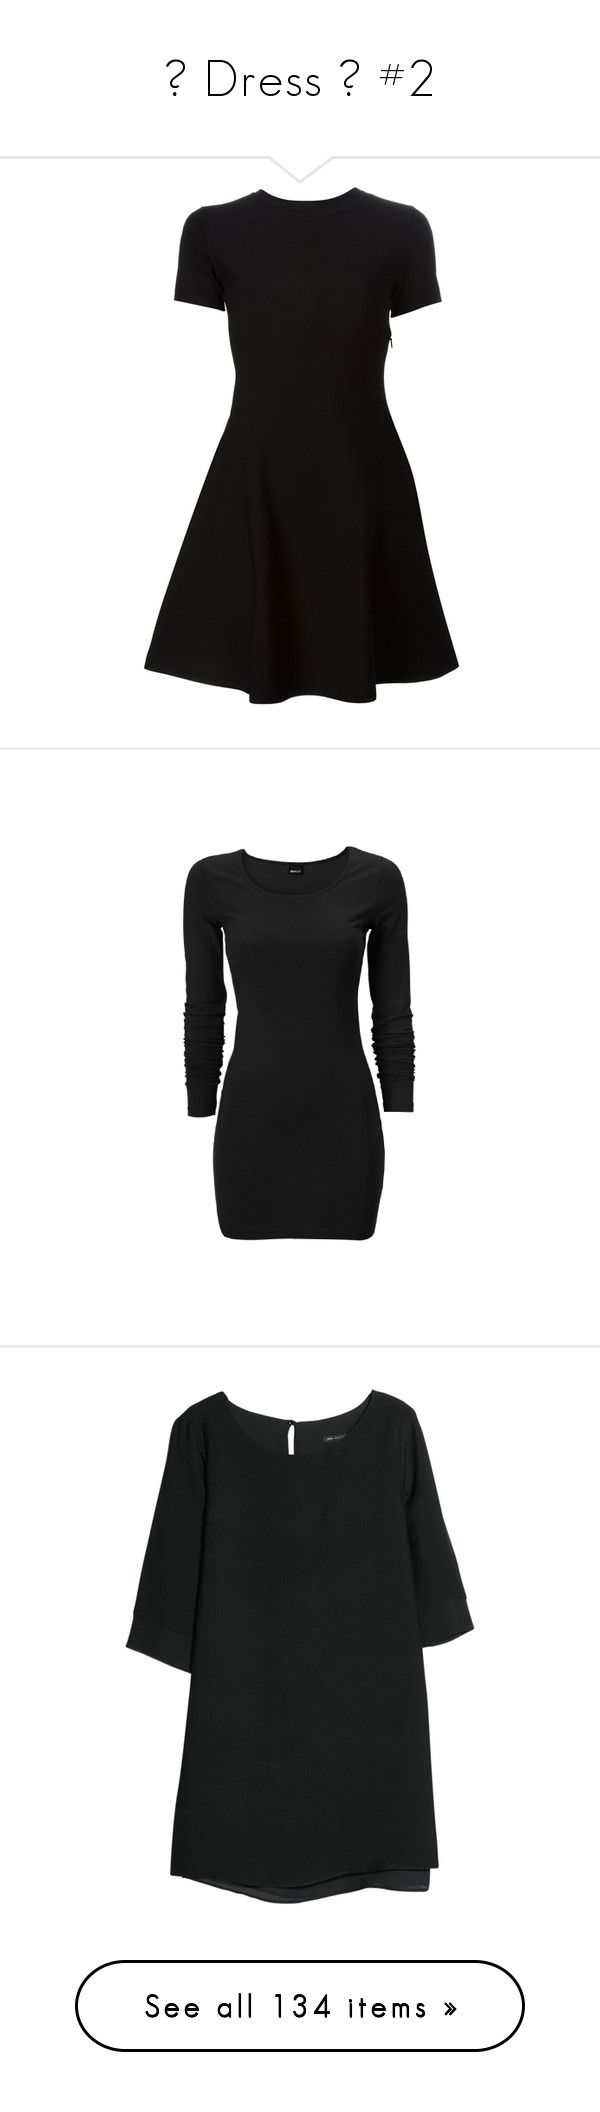 """♦ Dress ♦ #2"" by xxbbygrl ❤ liked on Polyvore featuring dresses, vestidos, black, short dresses, a line shape dress, short sleeve dress, mini dress, metallic mini dress, round neck dress and tops"